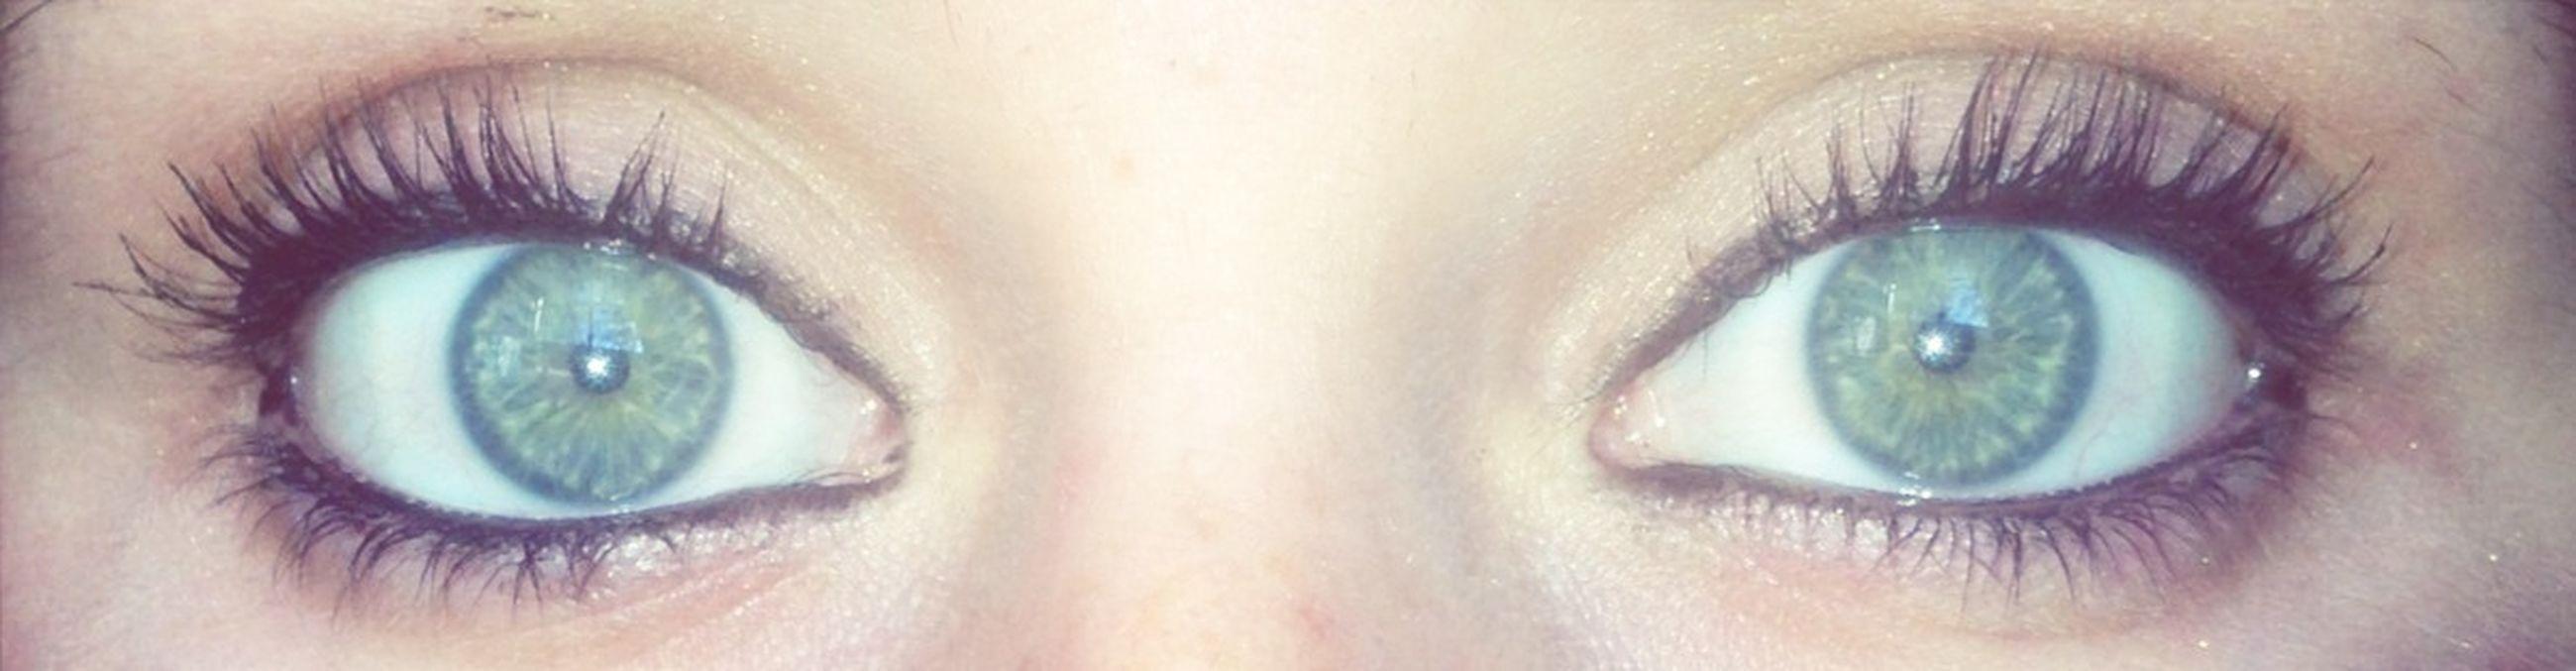 human eye, close-up, looking at camera, portrait, human face, reflection, eyelash, headshot, lifestyles, part of, eyesight, sensory perception, leisure activity, young adult, front view, eyeball, extreme close-up